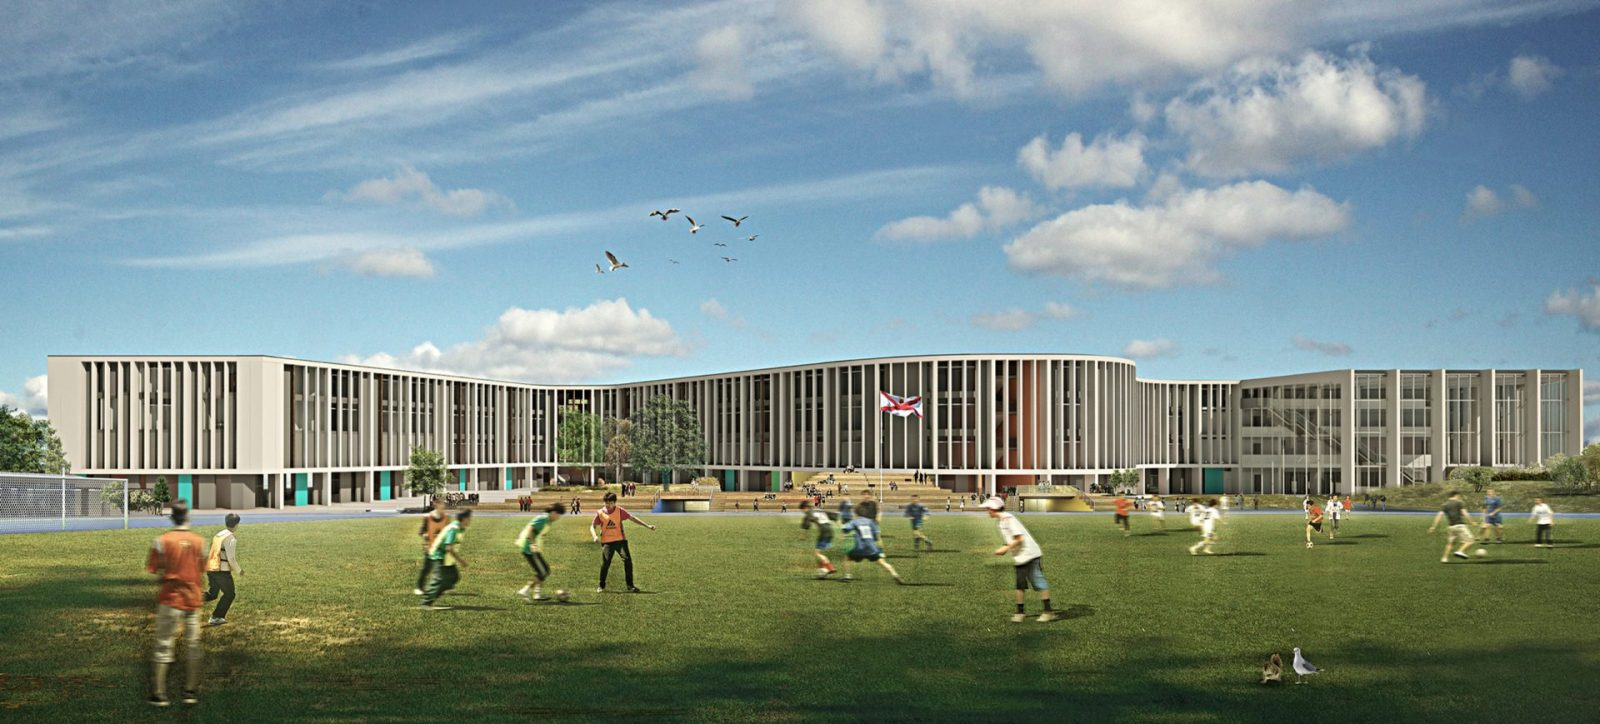 les quennavais school modern architecture st brelade jersey architecture4 2